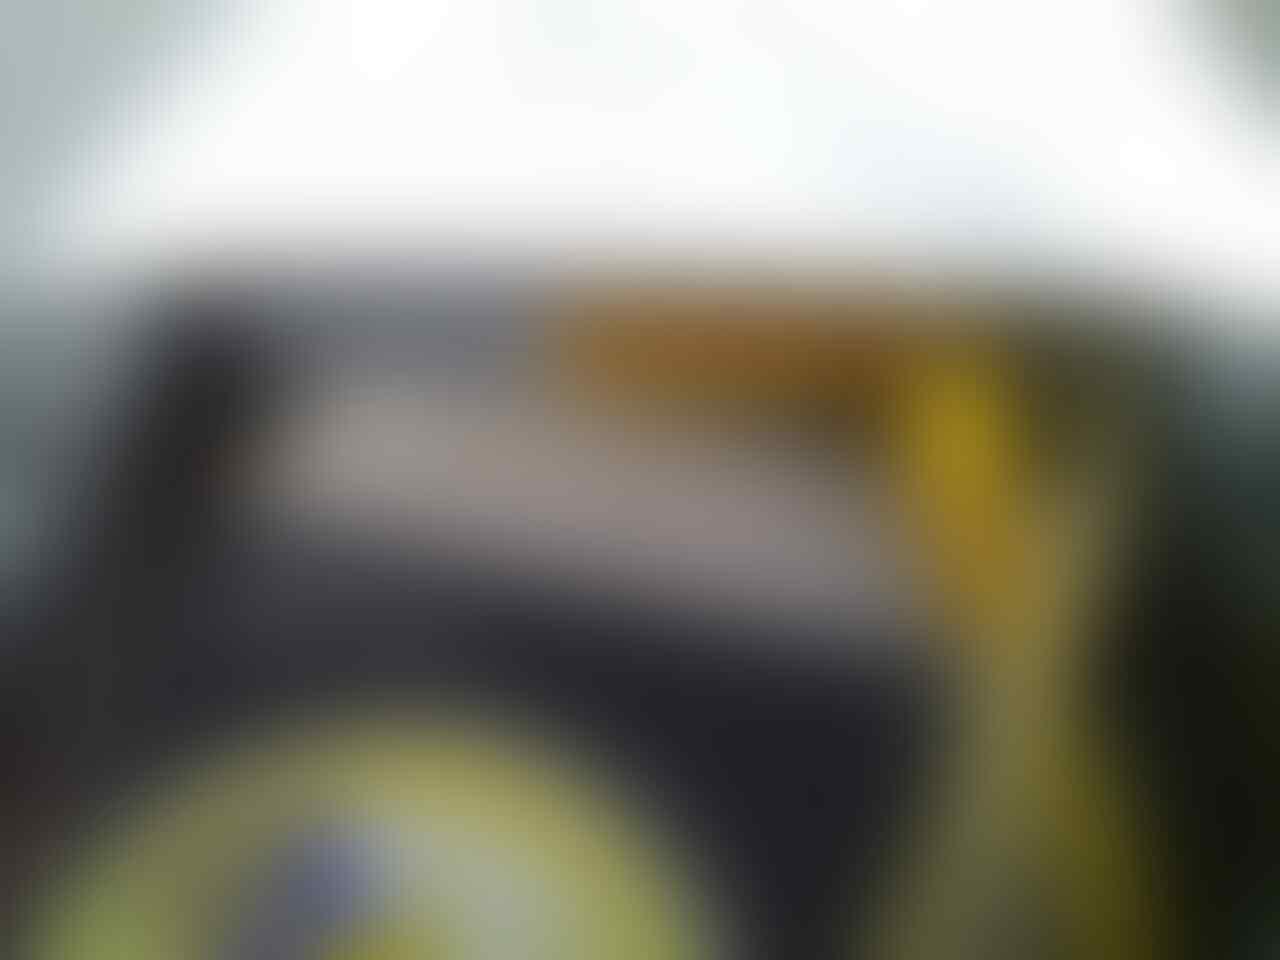 [HELP], gak bisa akses 192.168.1.254 TP-LINK Indihome